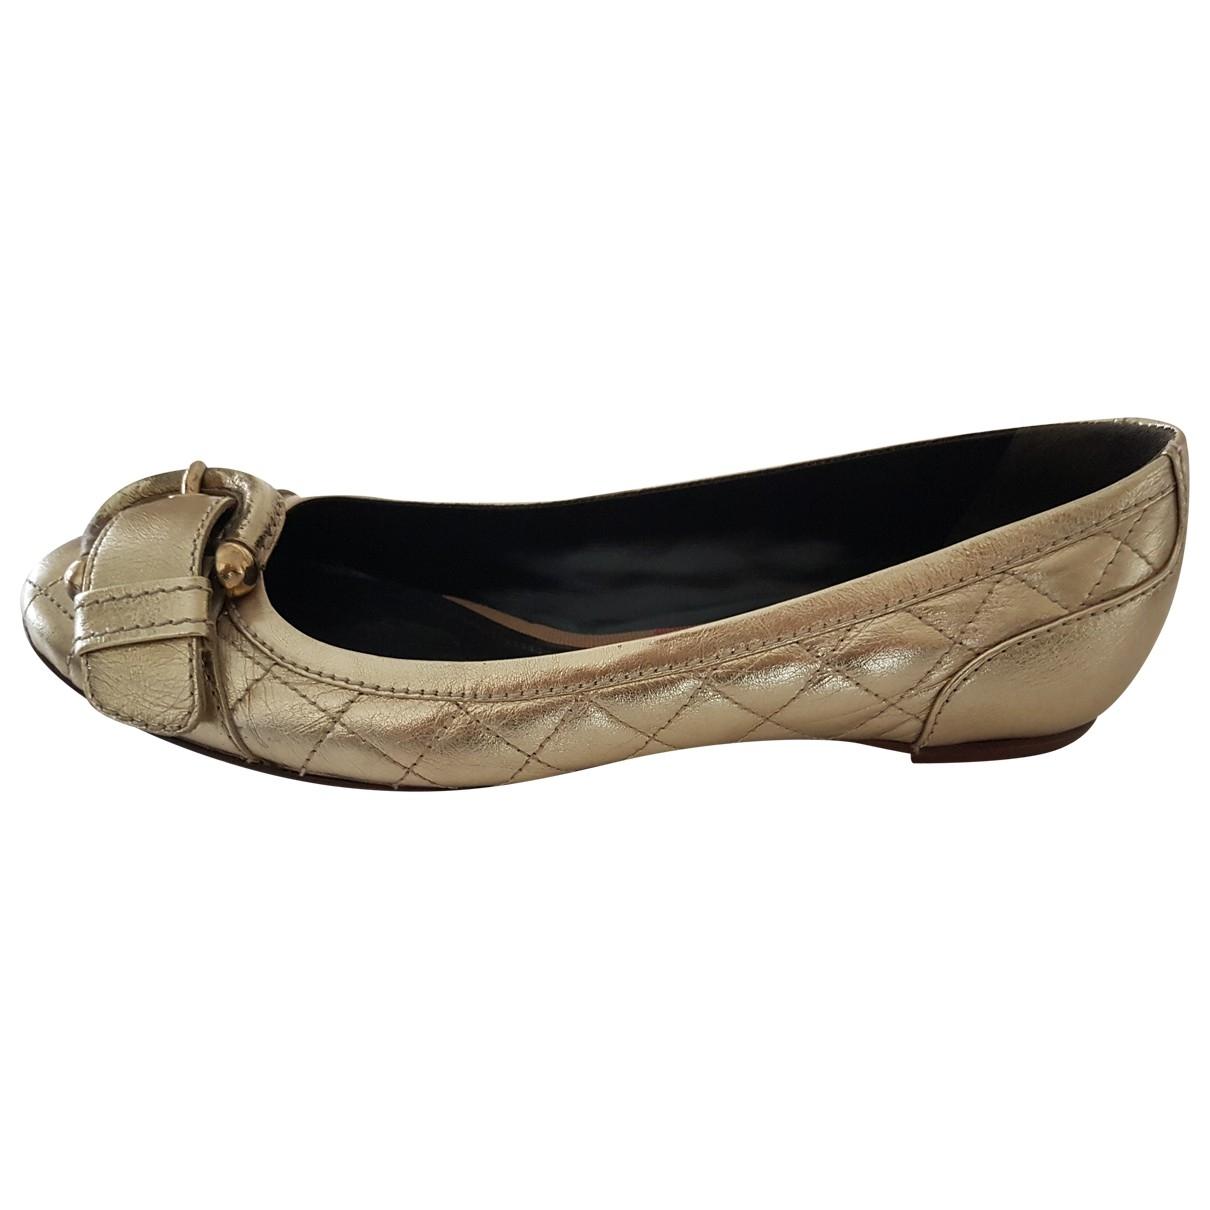 Burberry \N Gold Leather Ballet flats for Women 37 EU